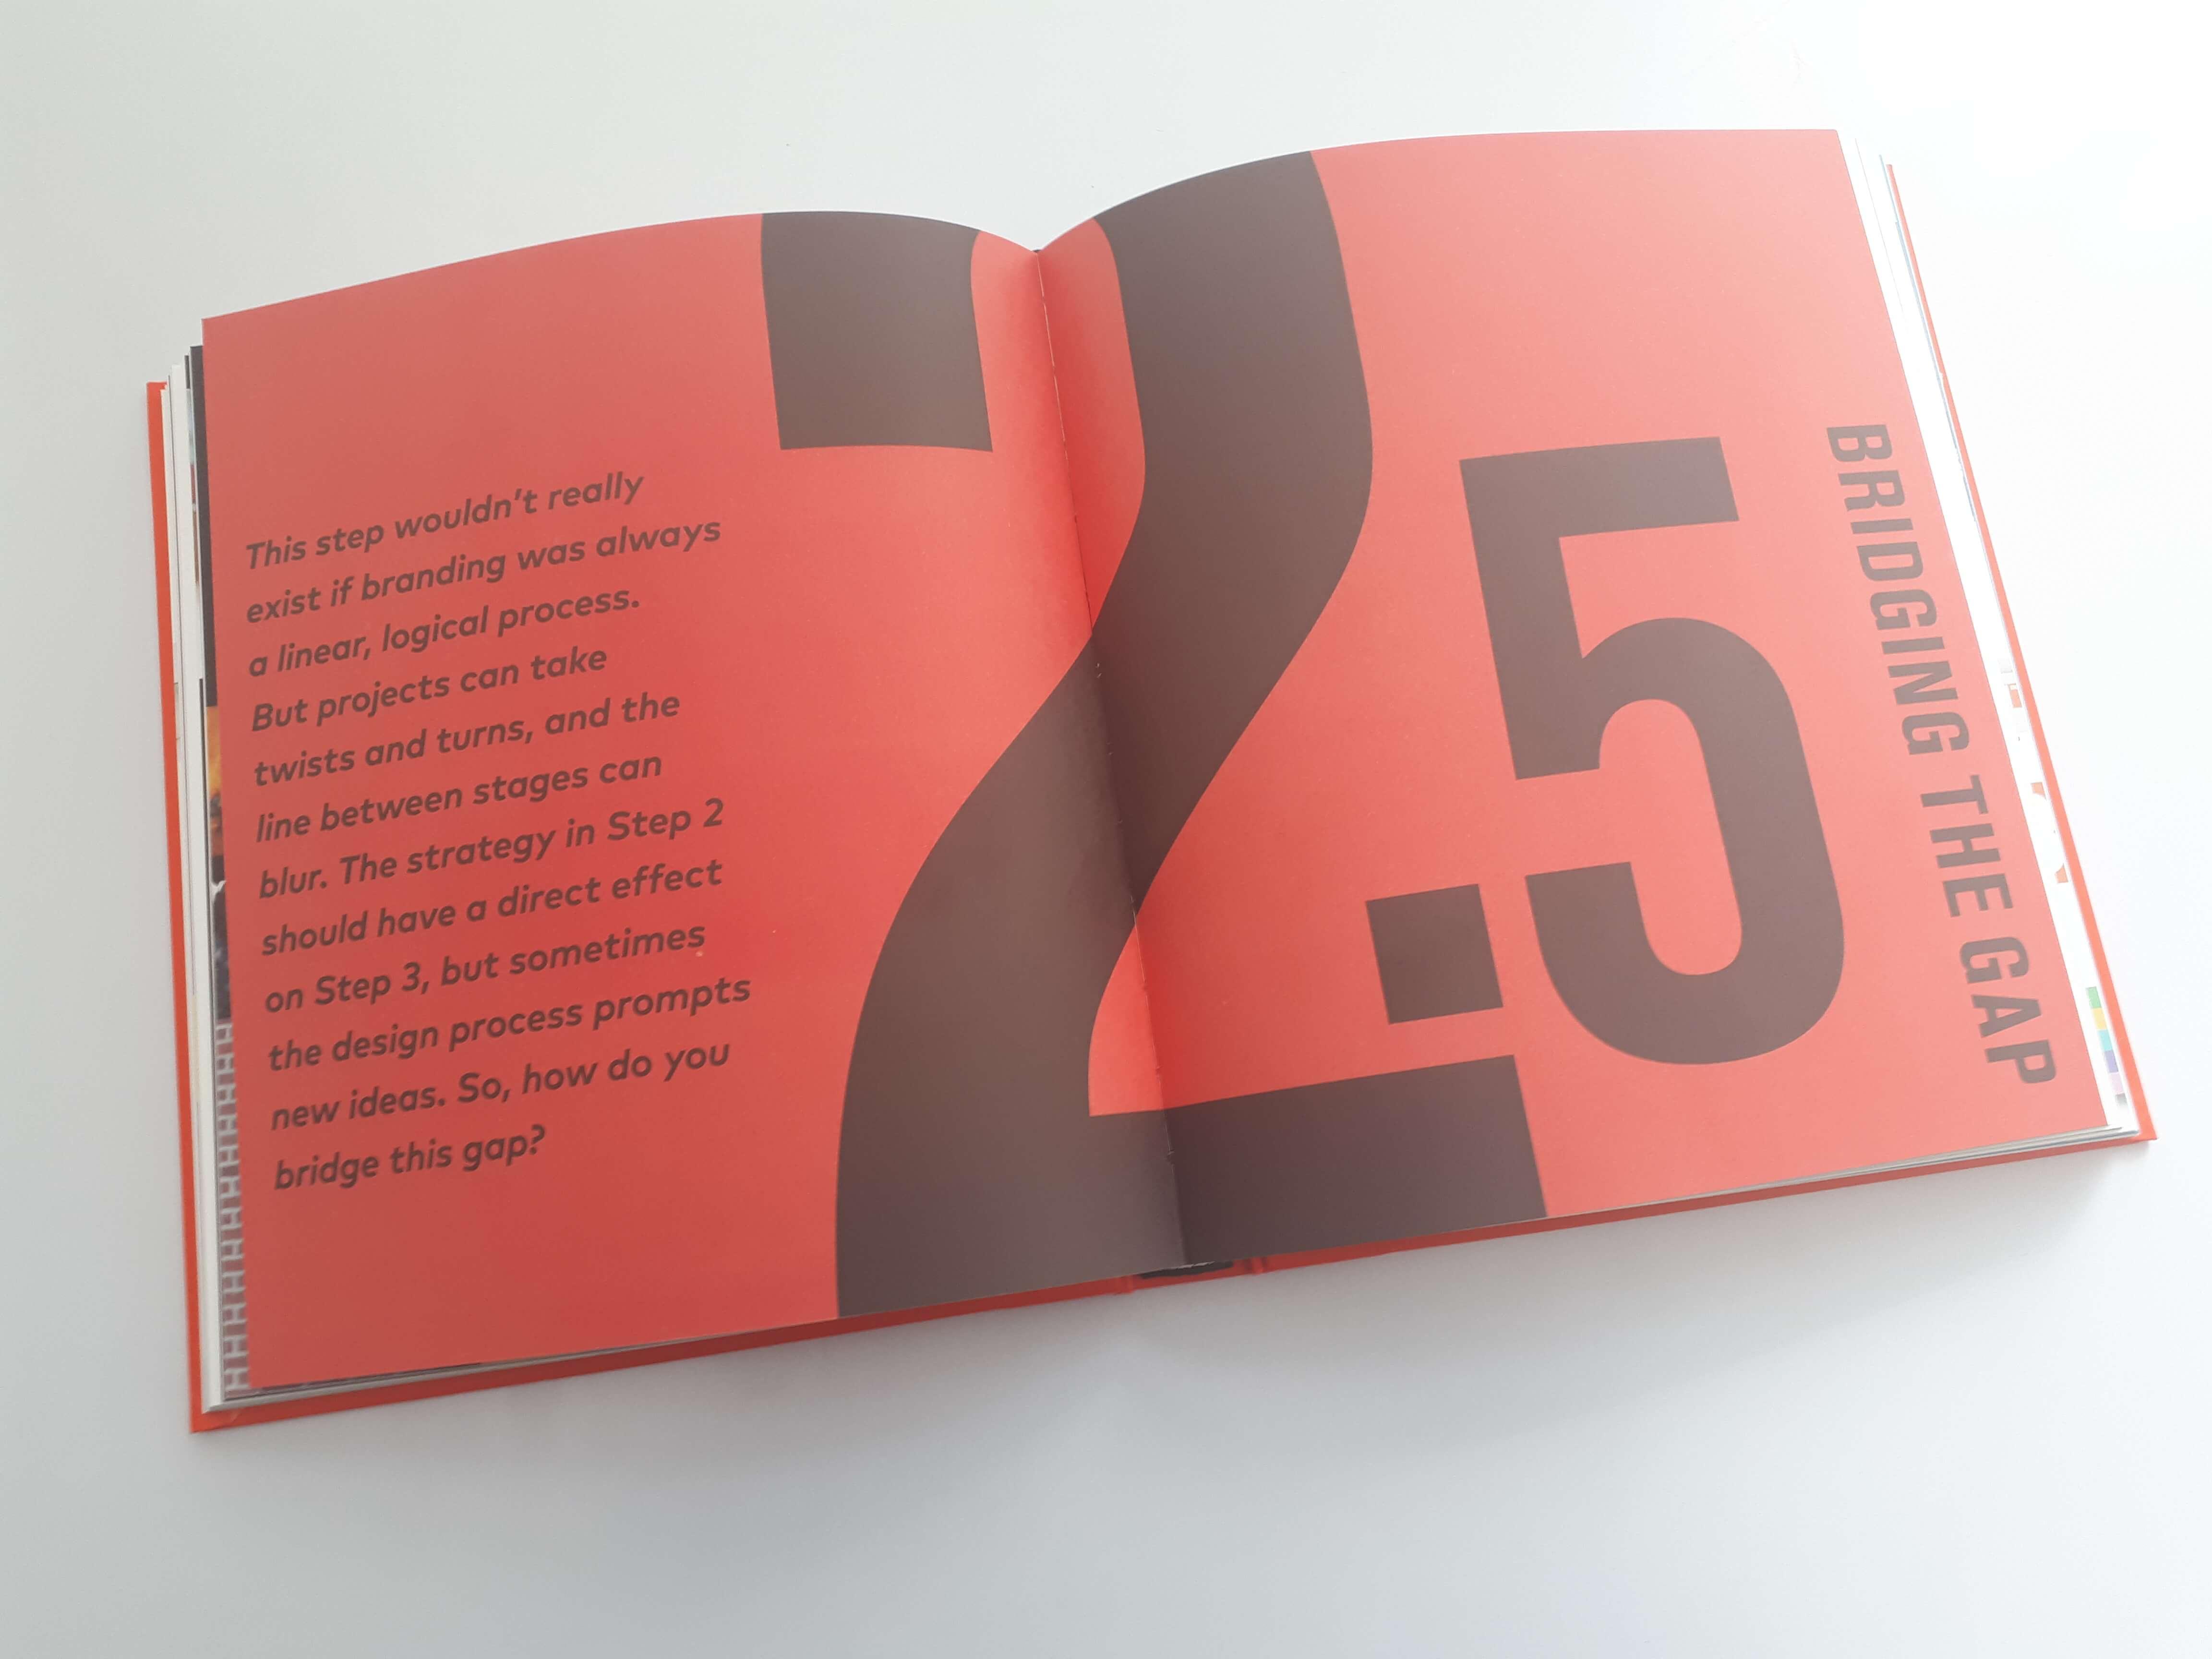 Designer Interview With Michael Johnson - JohnsonBanks